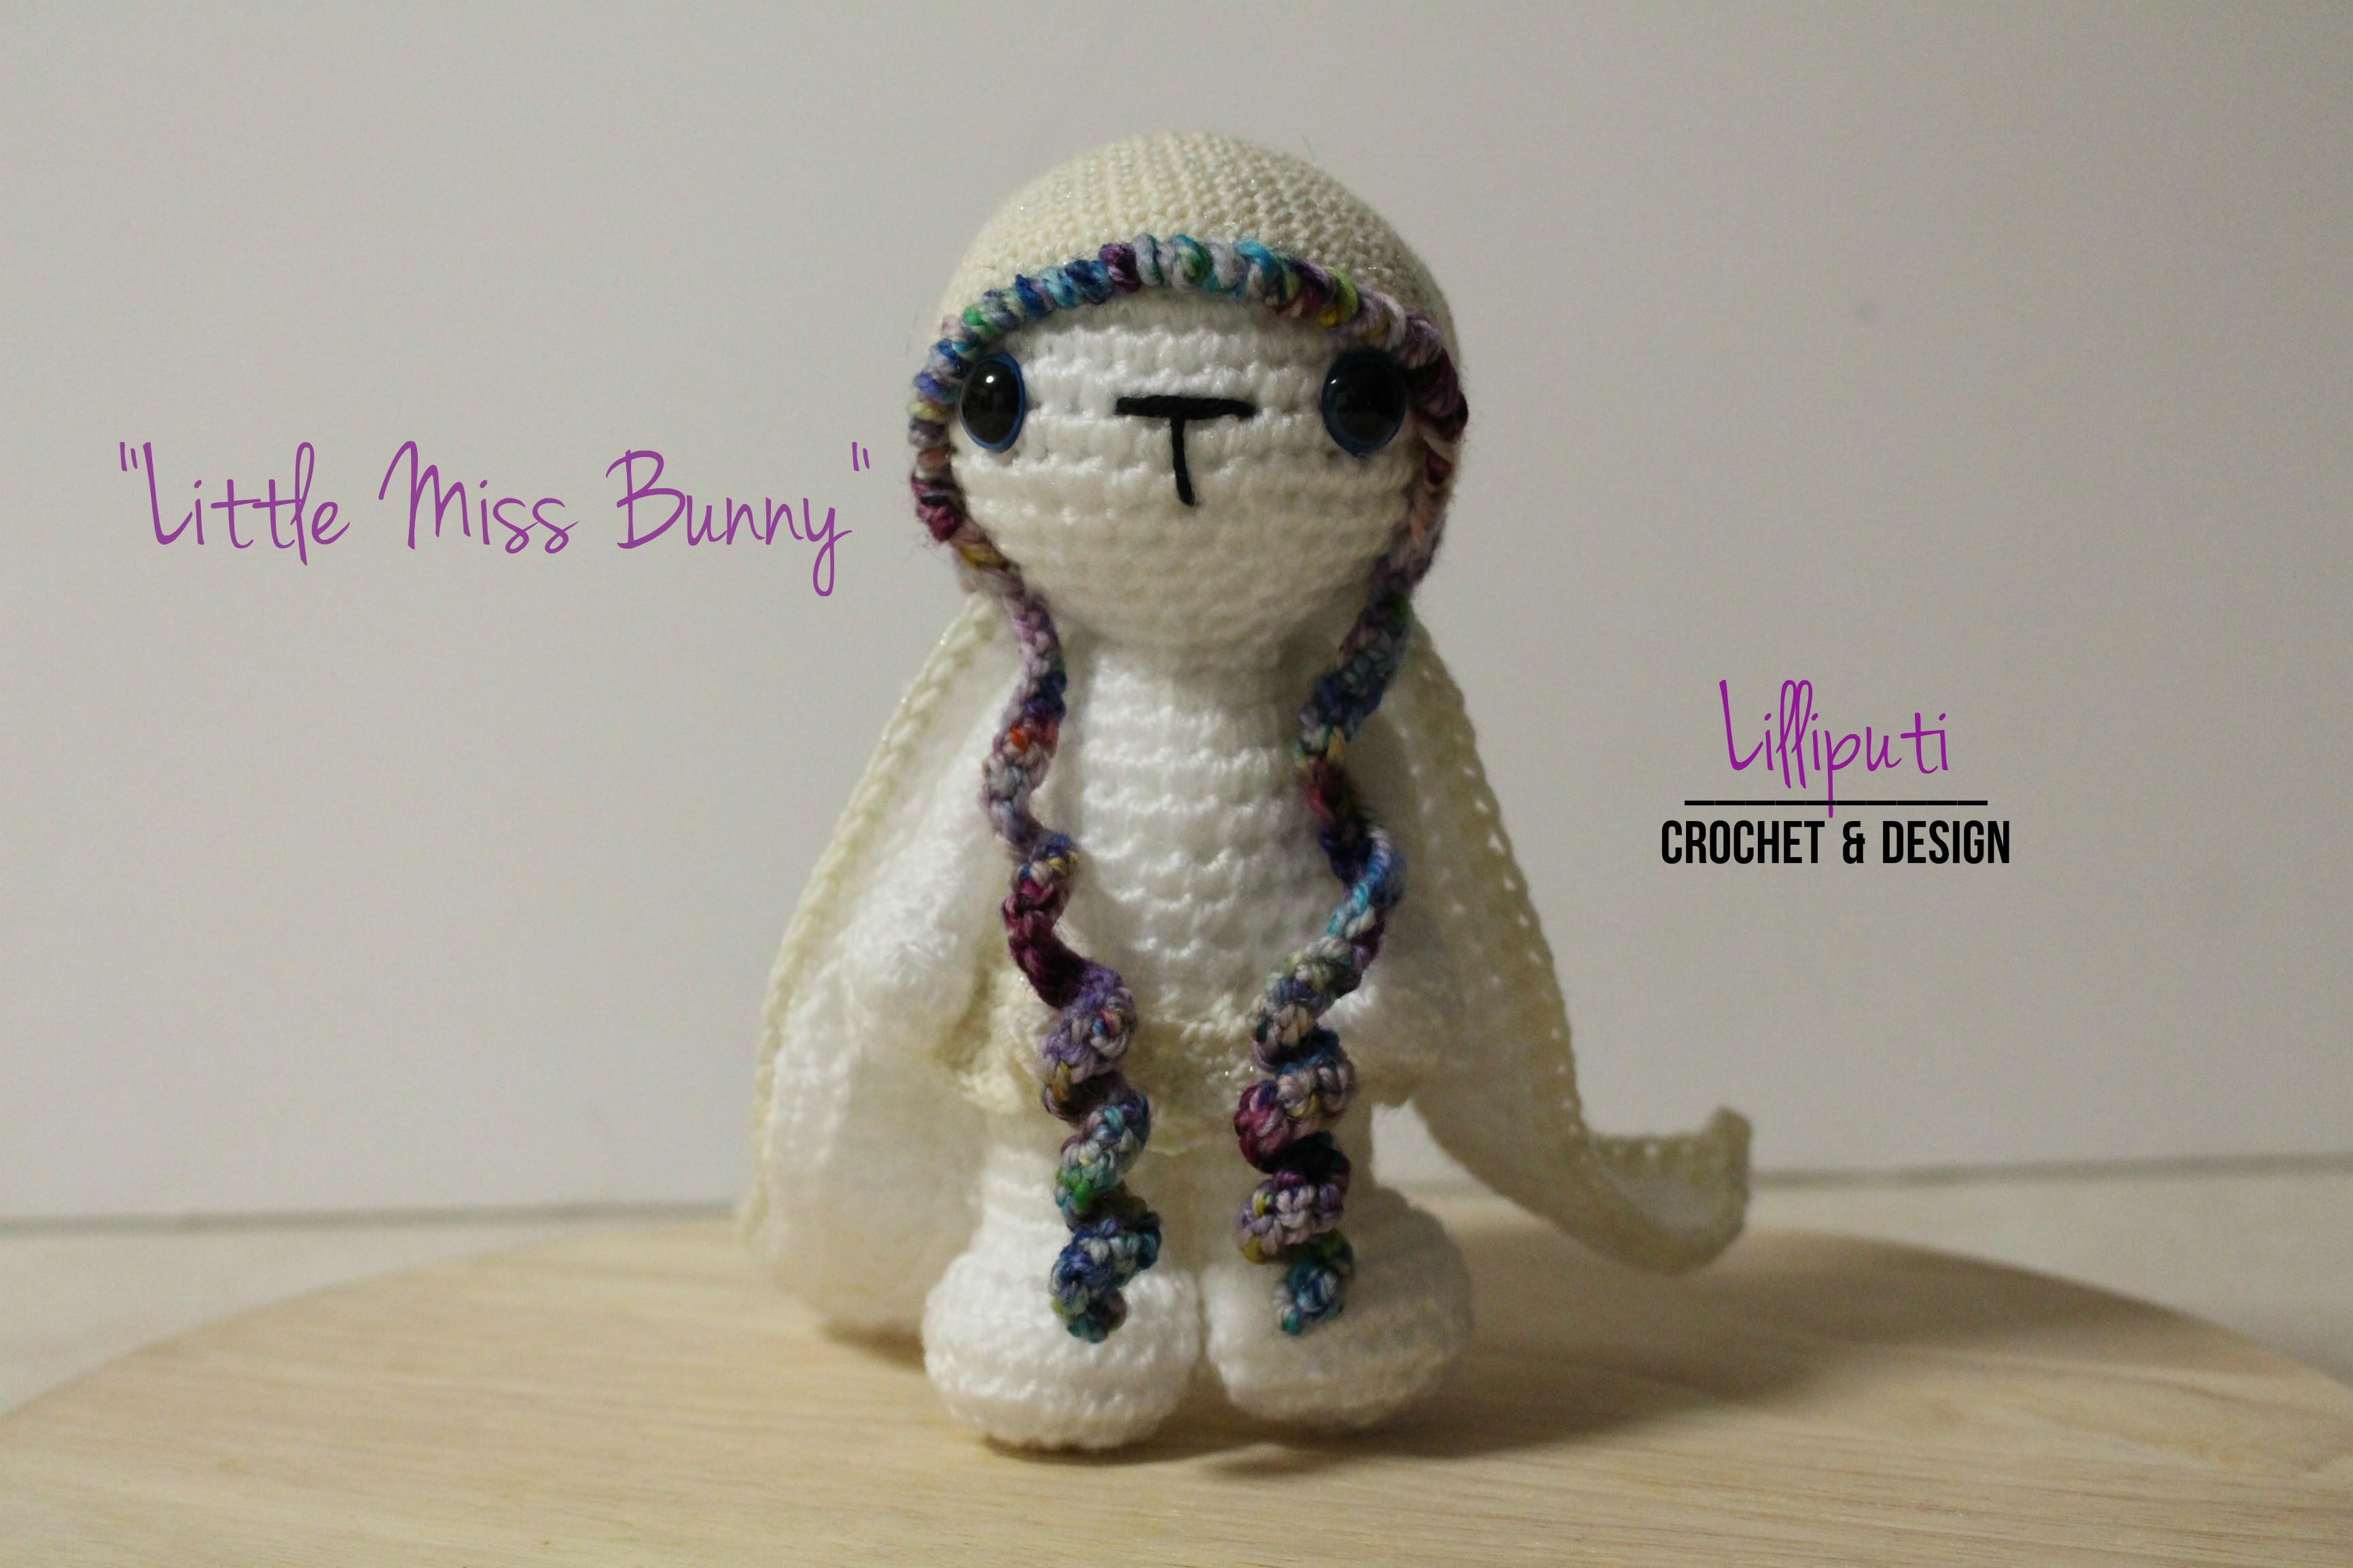 mr. Ted and miss Bunny amigurumi pattern | Идеи для поделок, Схемы ... | 2309x3464